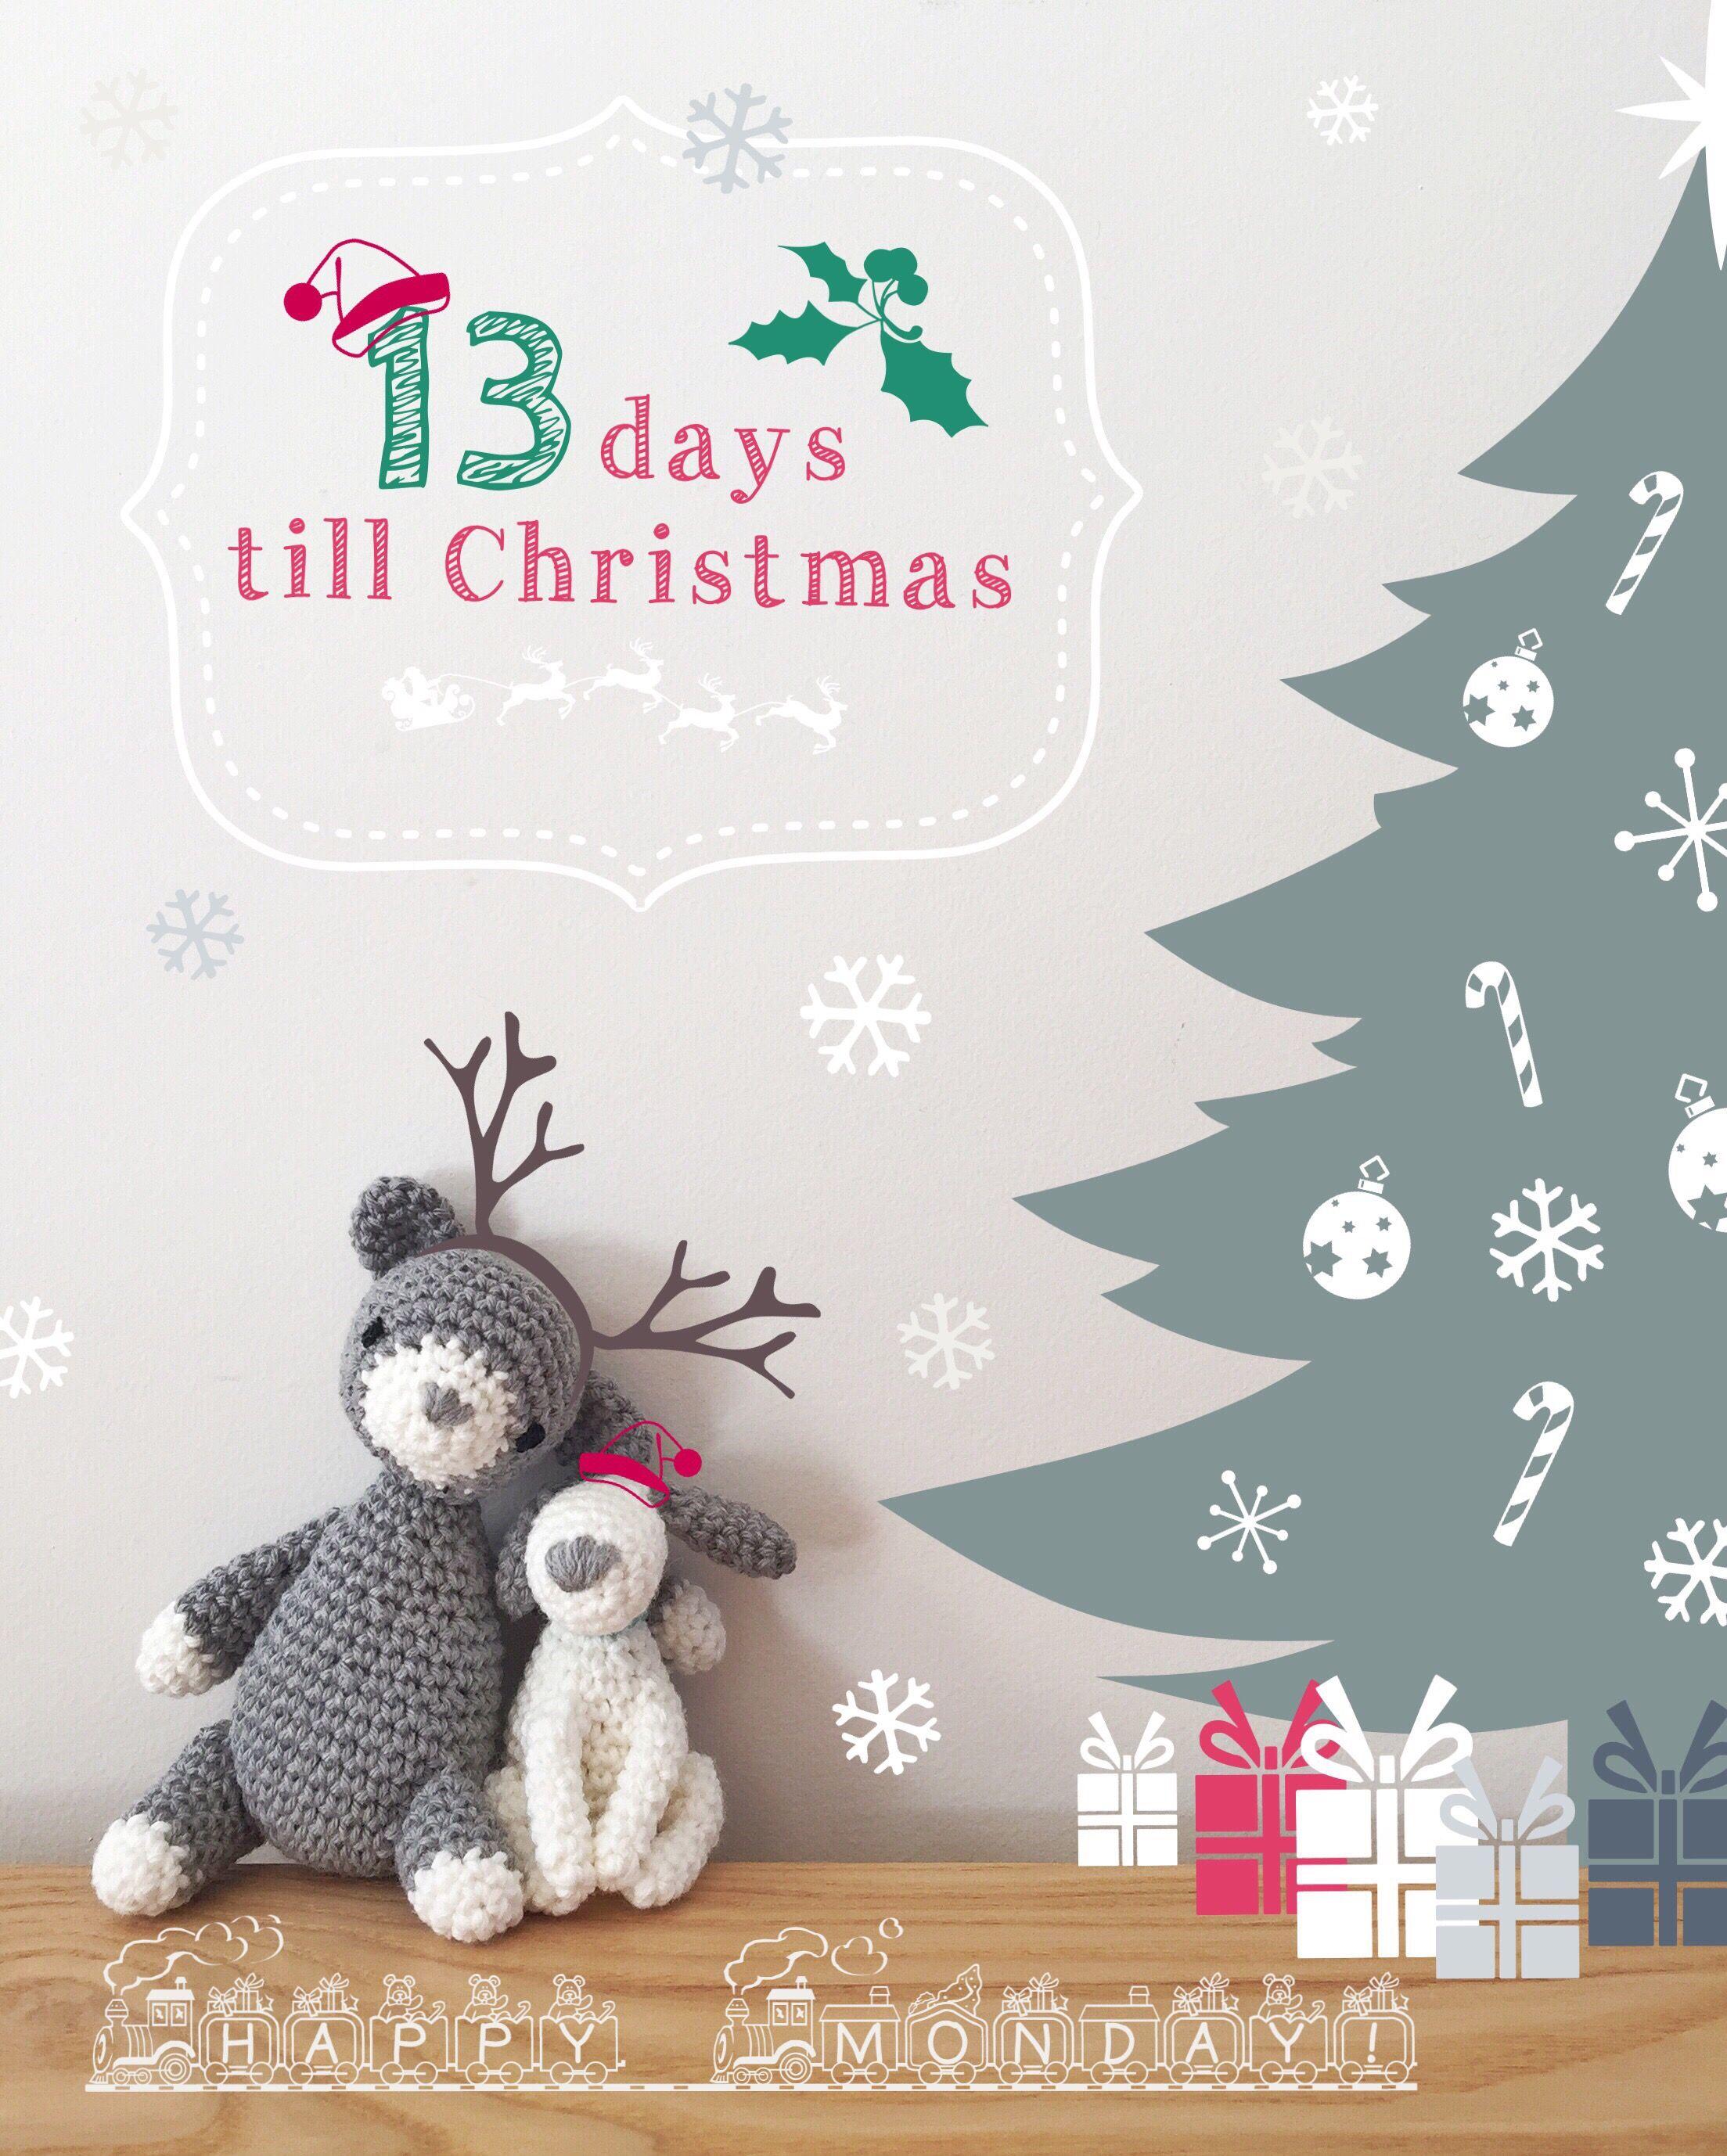 13 days till #Christmas